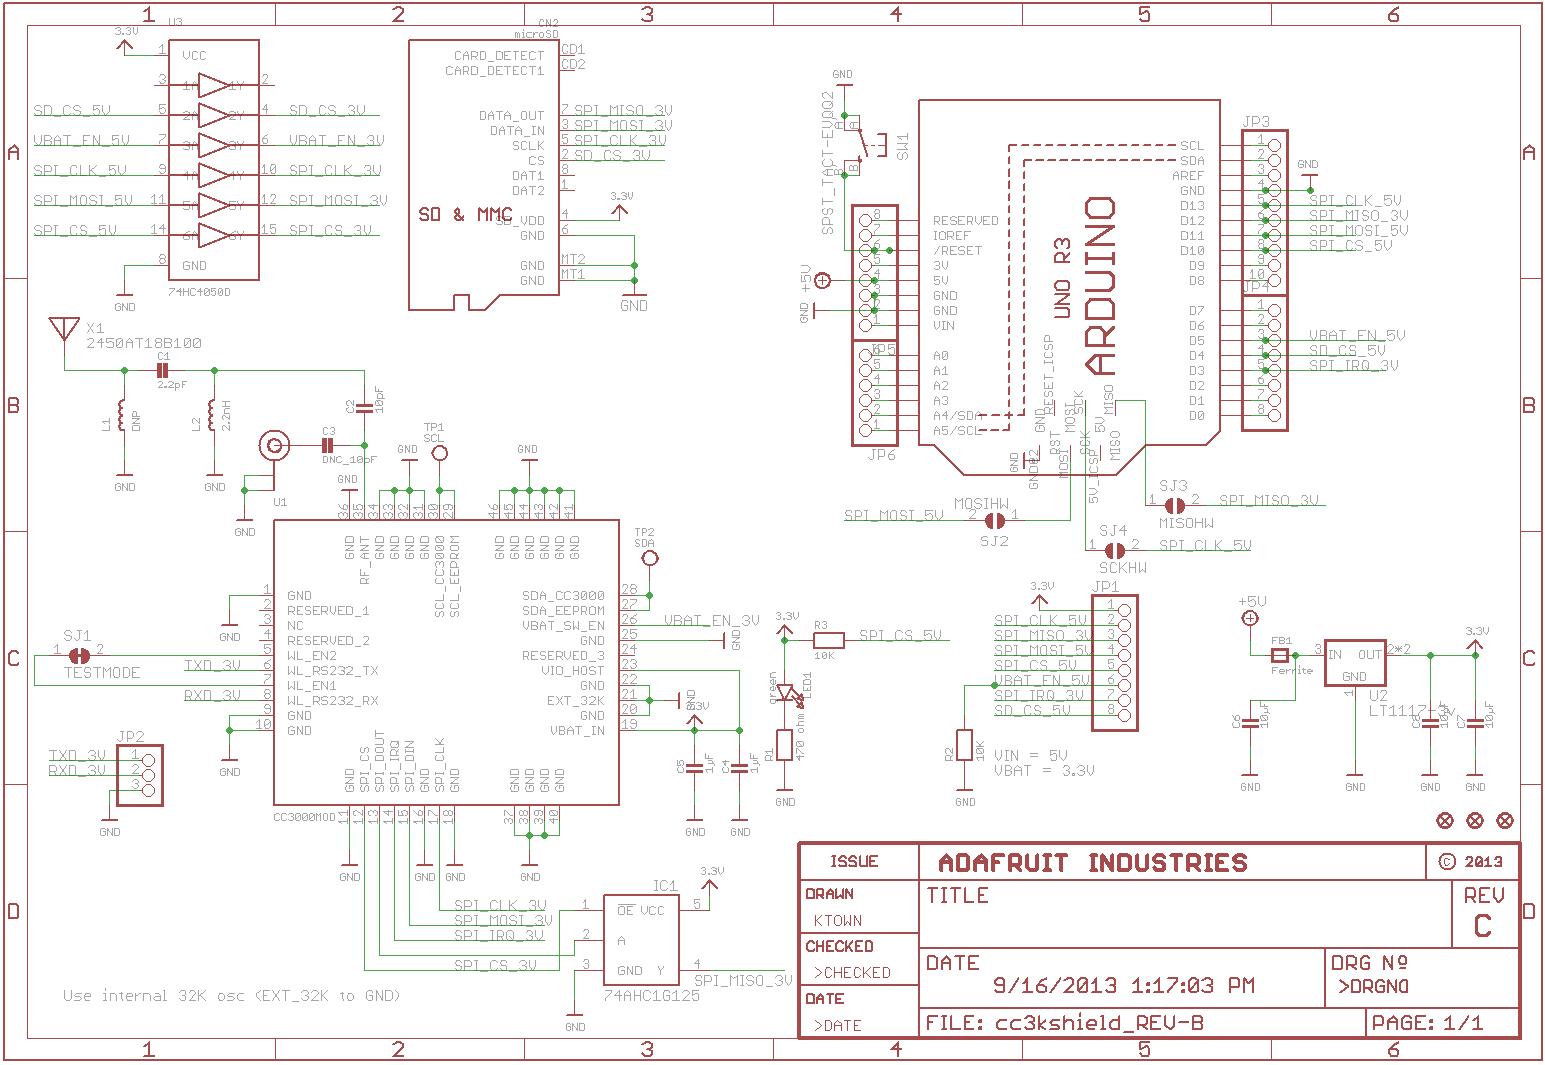 Ftdi Usb Serial Cable Wiring Diagram Pololu Adafruit Cc3000 Wi Fi Shield For Arduino With